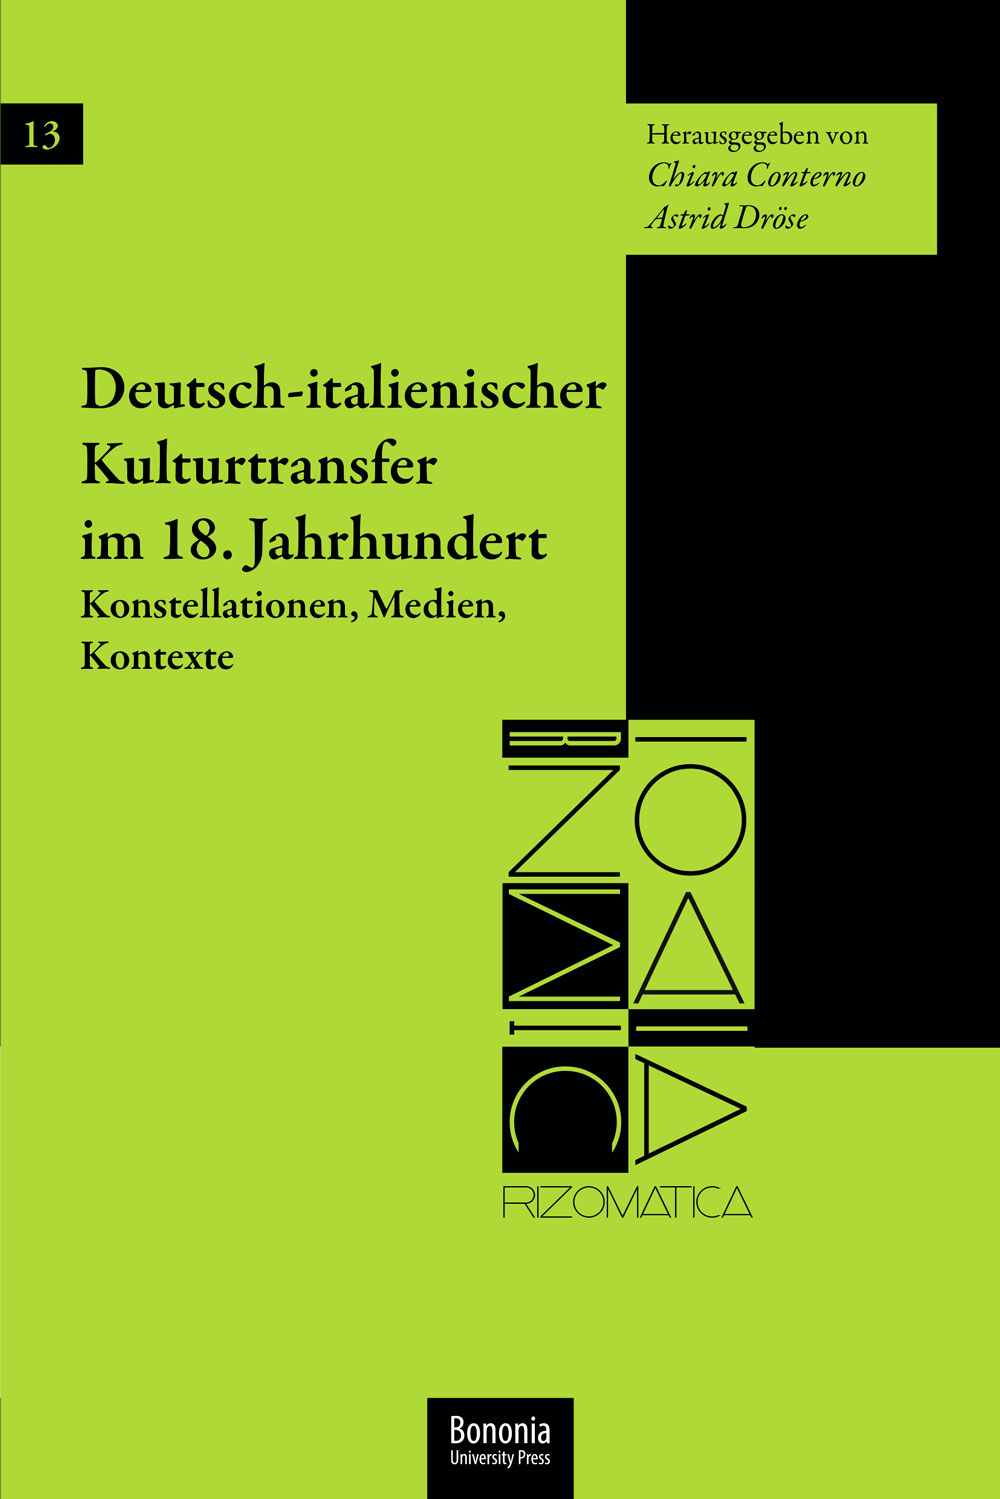 Deutsch-italienischer Kulturtransfer im 18. Jahrhundert - Bononia University Press